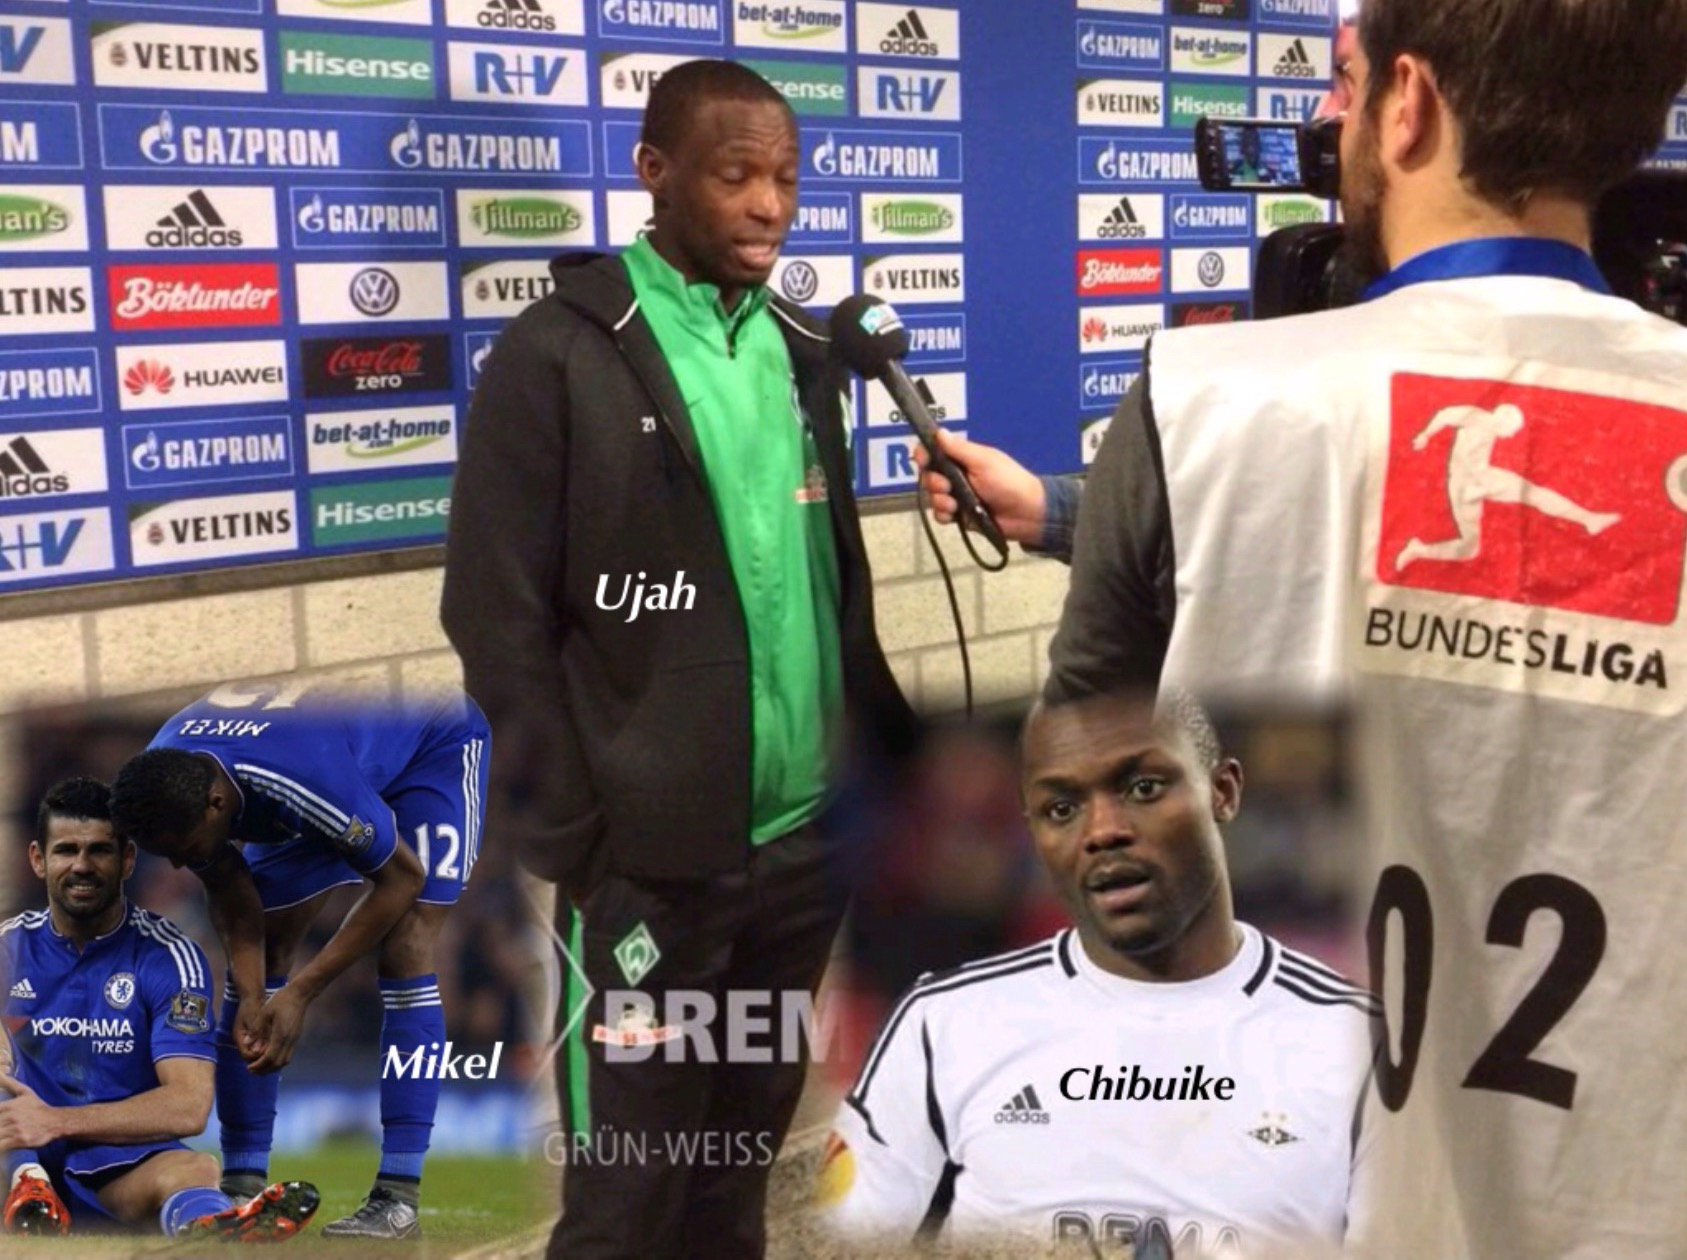 Naija Made! Ujah, Chibuike On Target; Mikel, Oboabona, Simon, In Action